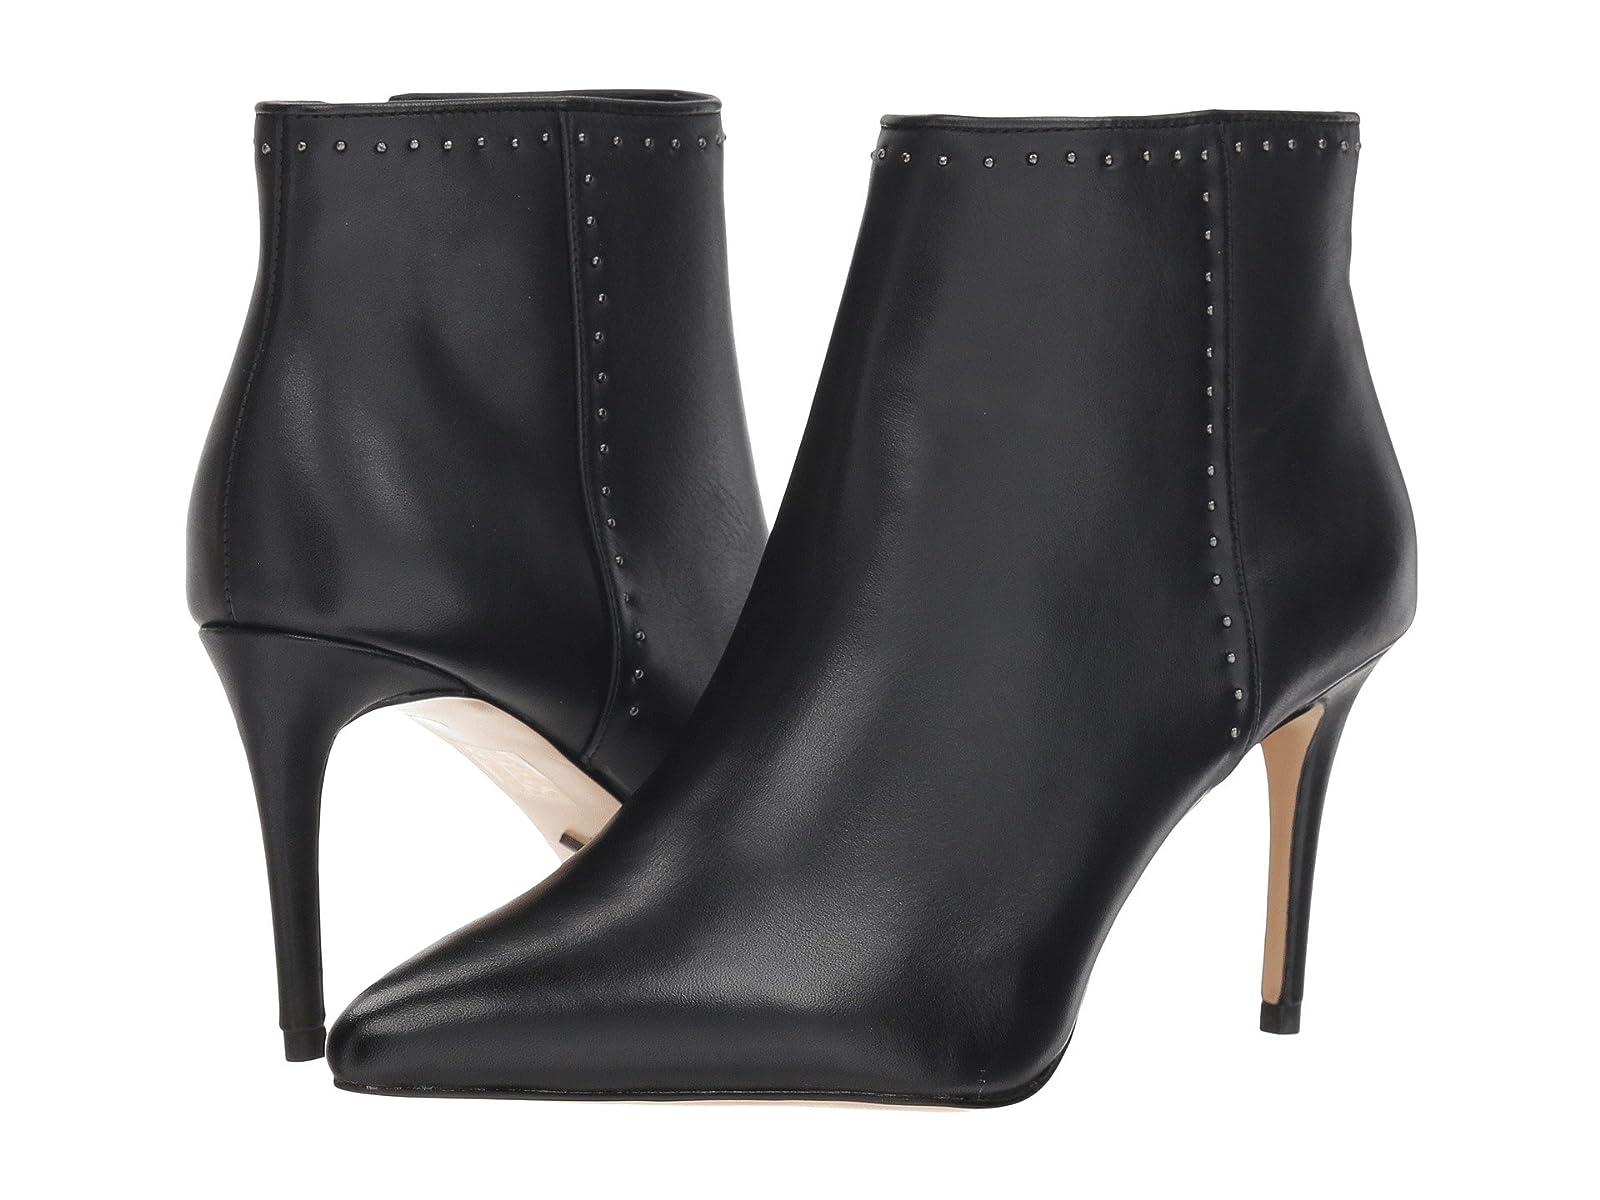 Donna Karan LizzyAffordable and distinctive shoes